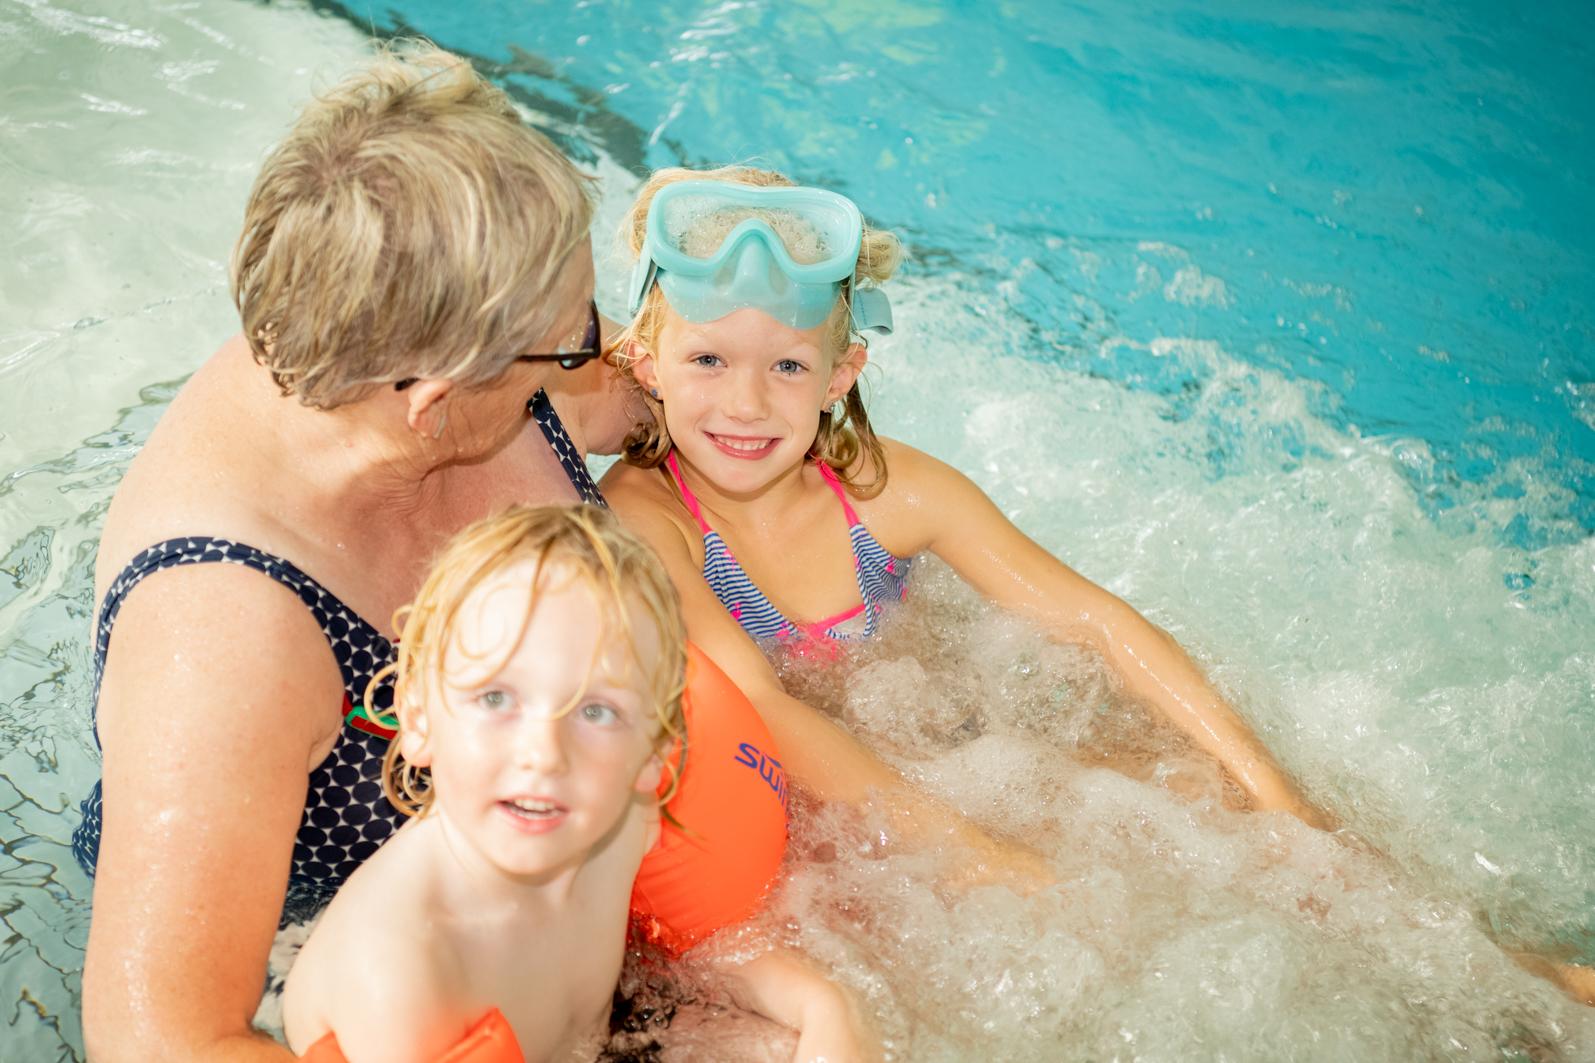 Zwem plezier